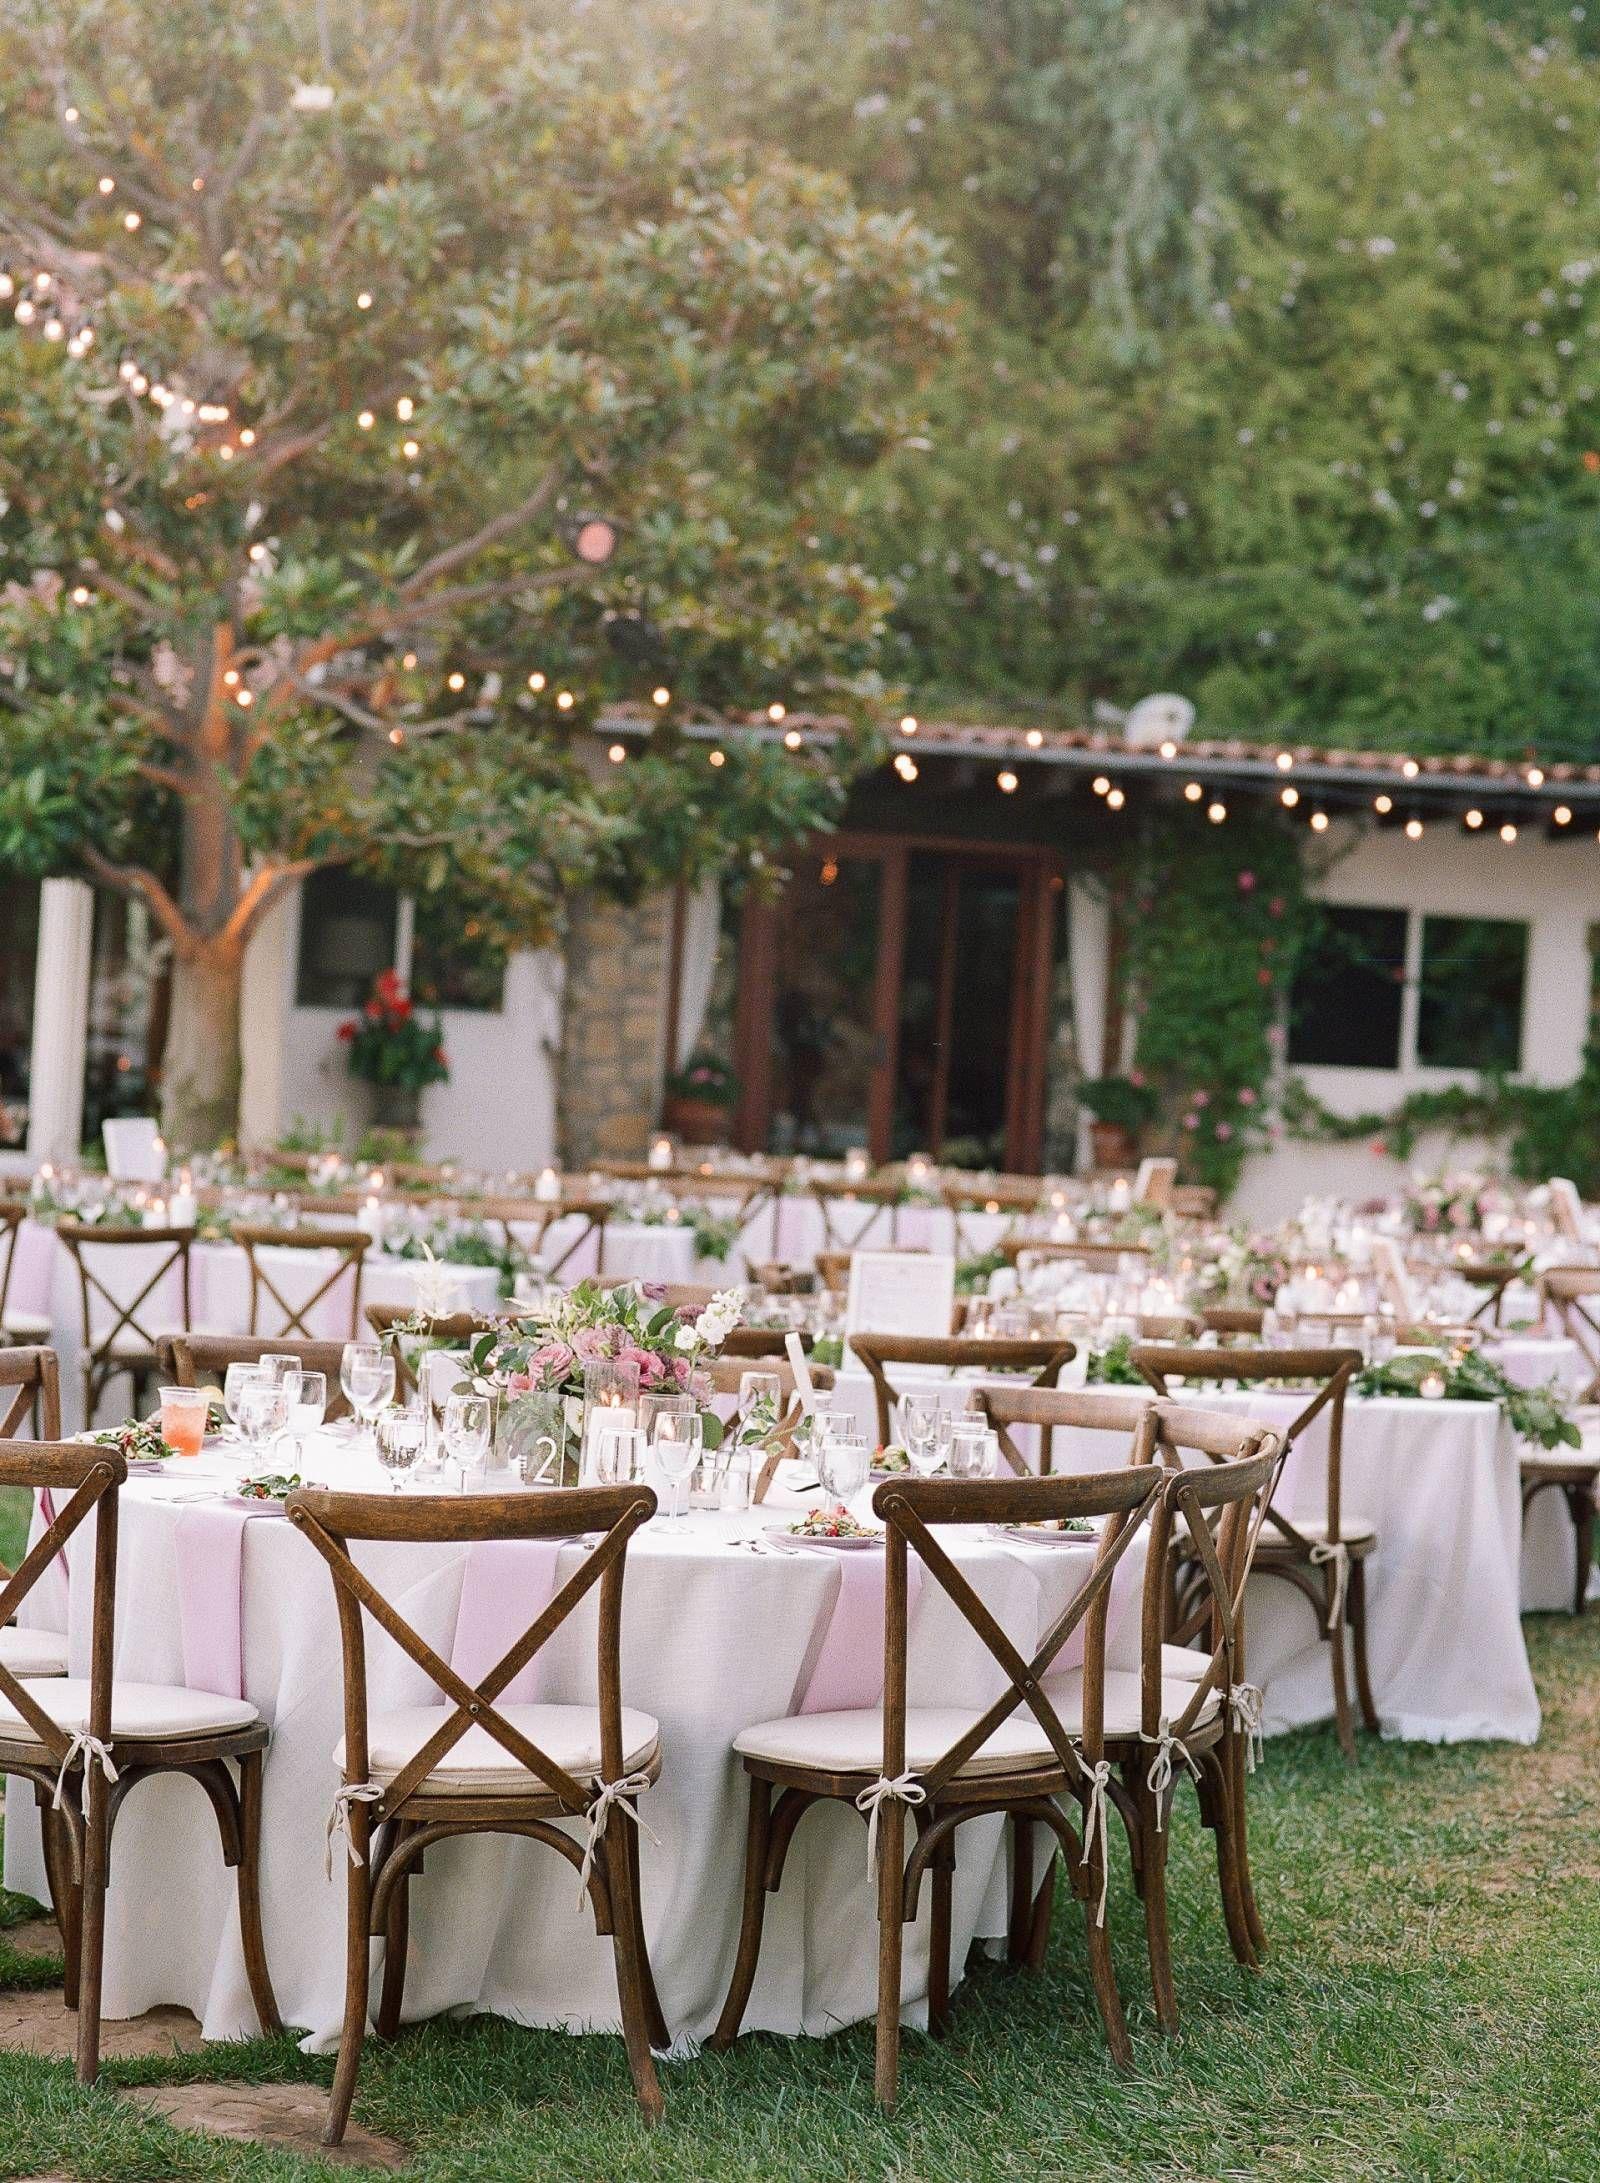 Beautiful California Wedding At A Private Estate In Malibu Via Magnolia Rouge In 2020 Cyprus Wedding Venues Cyprus Wedding Fairytale Destination Wedding